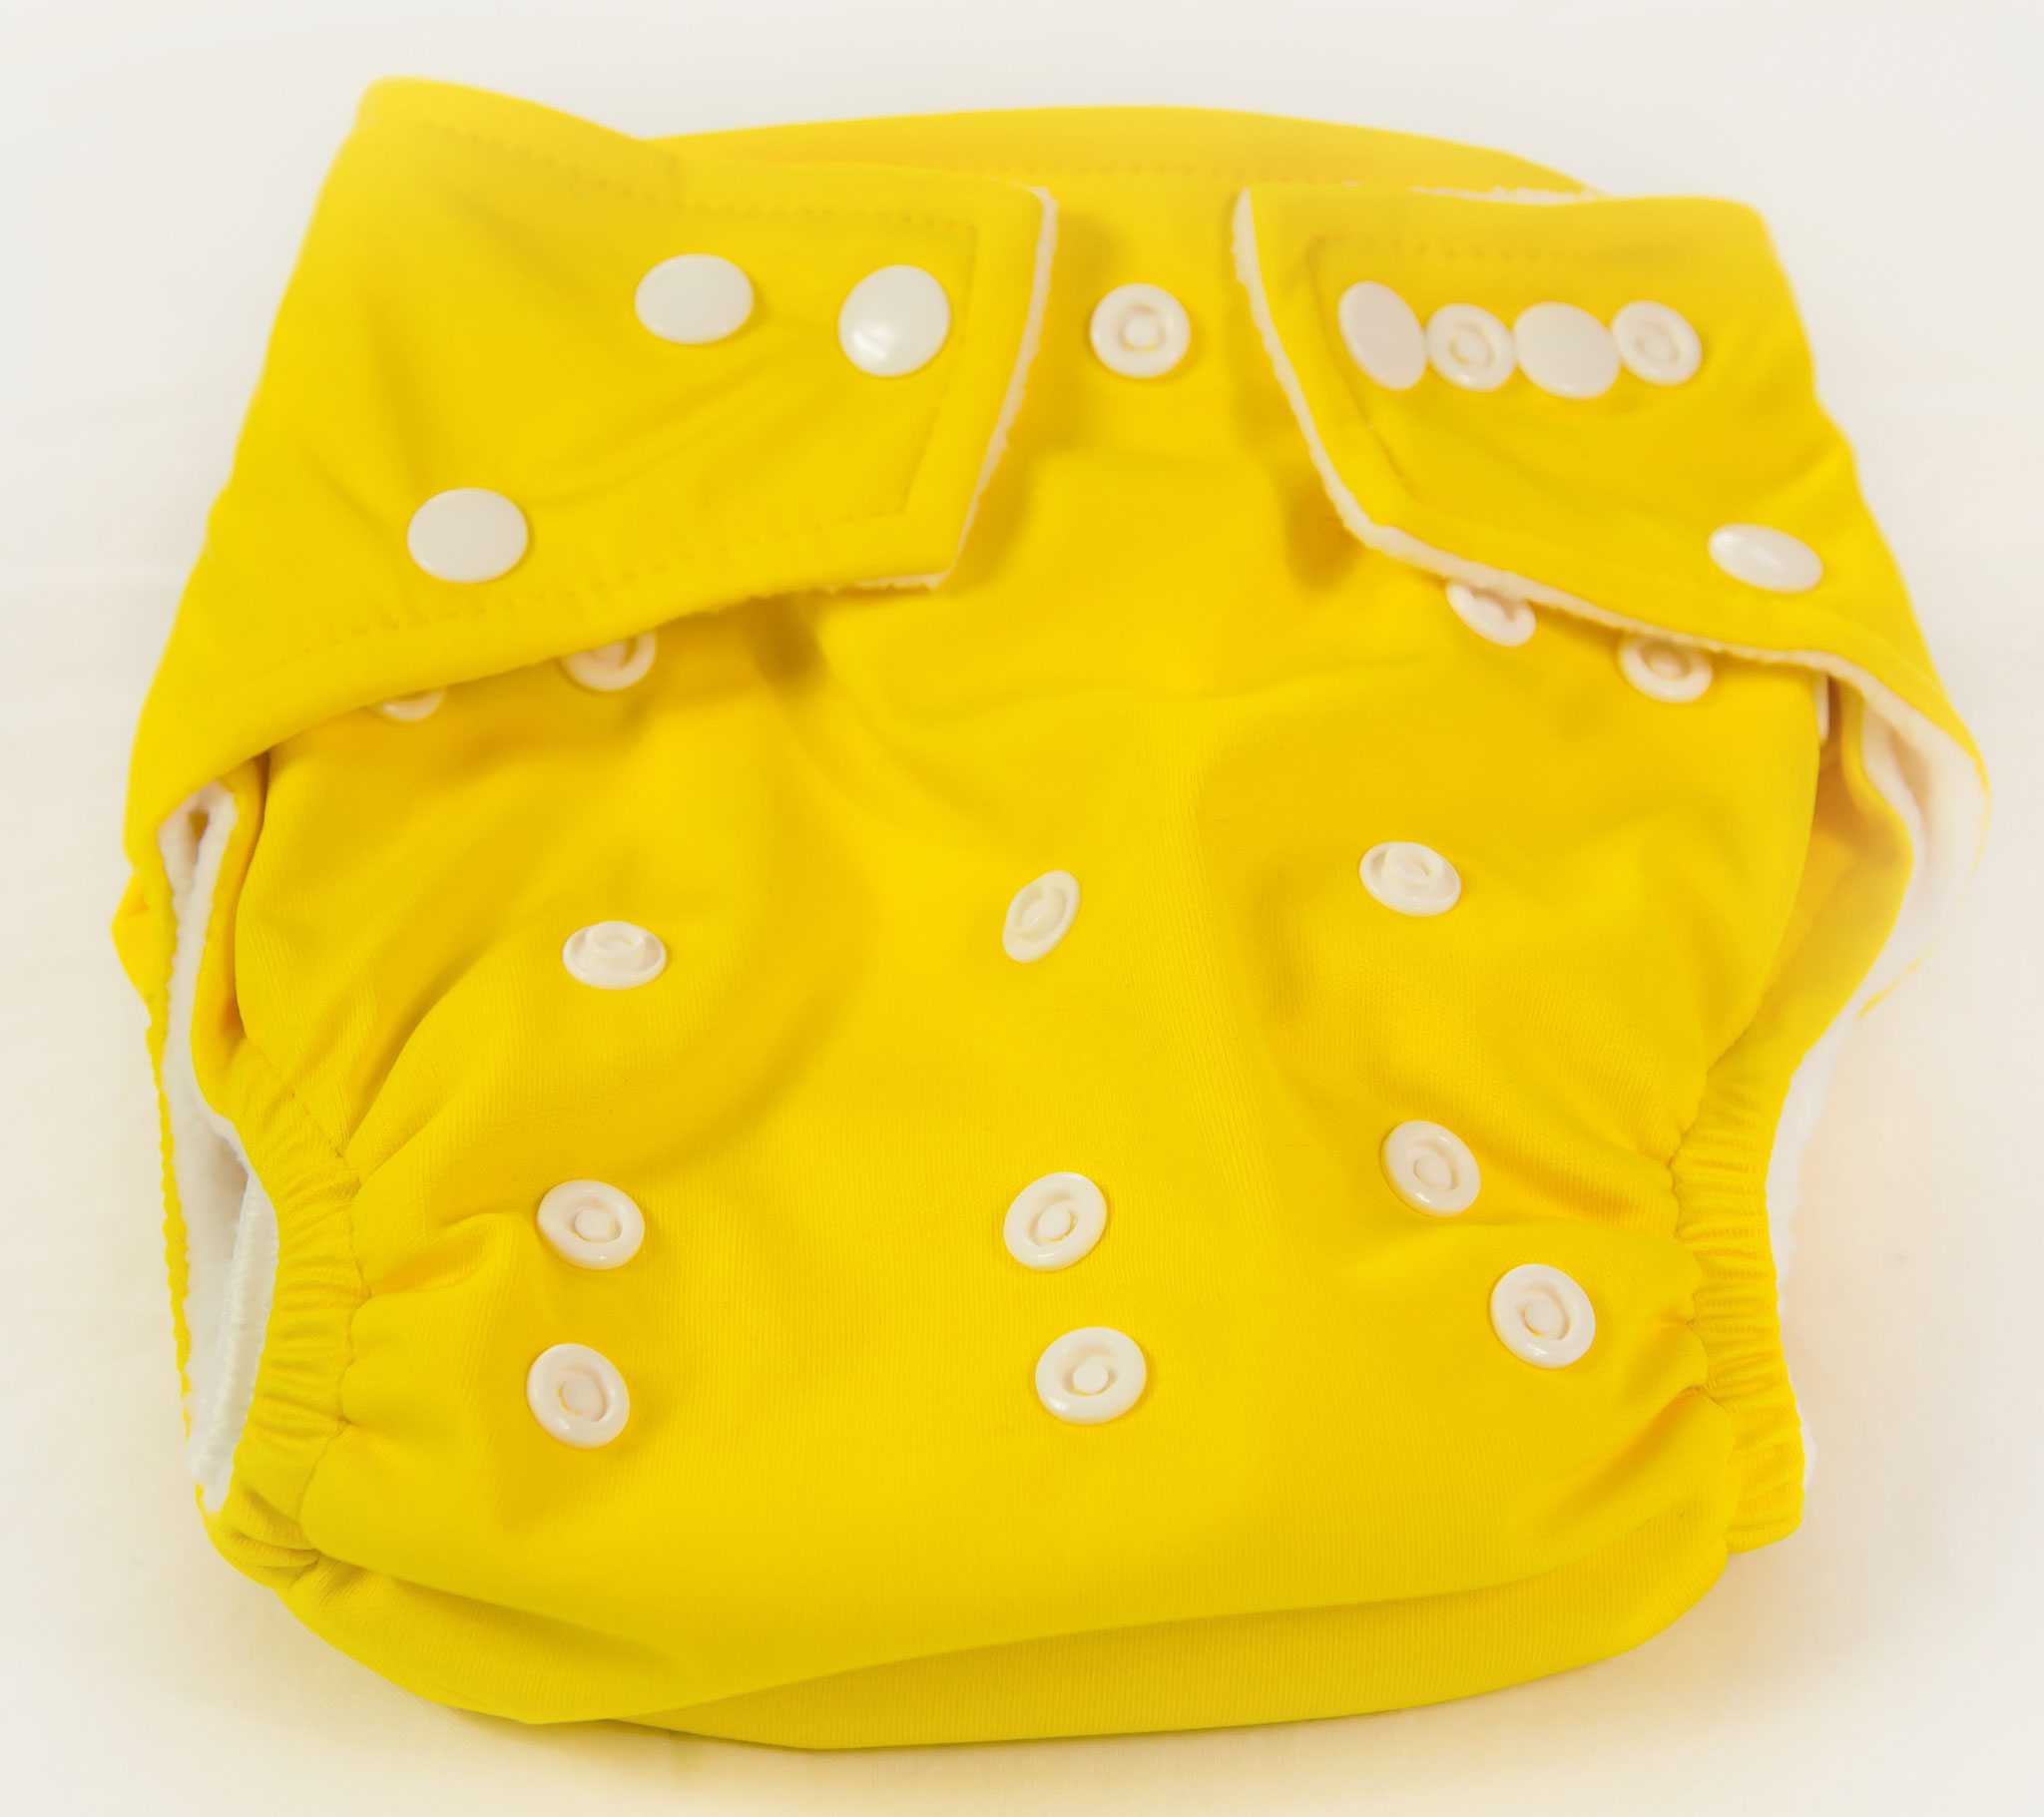 Stay Dry gelb / jaune